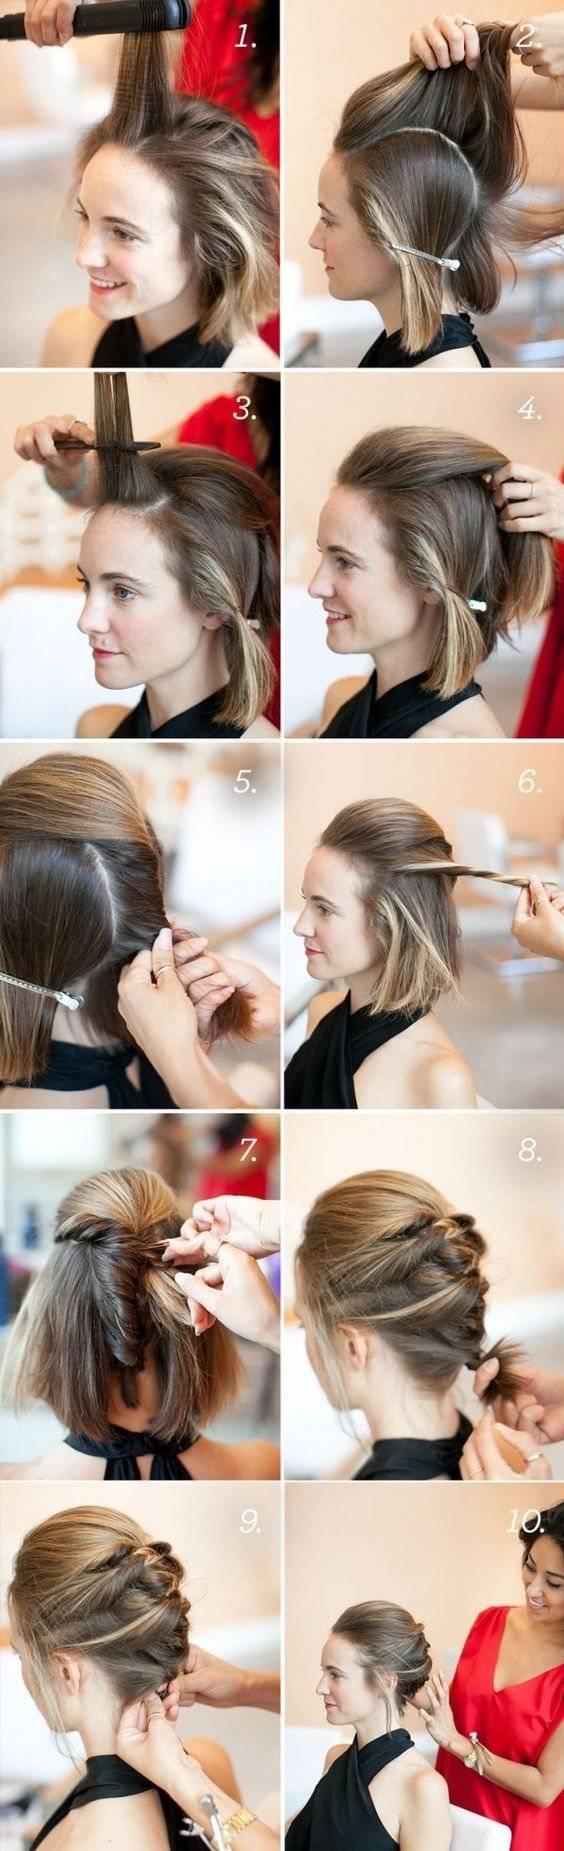 Peinados de noche para cabello corto